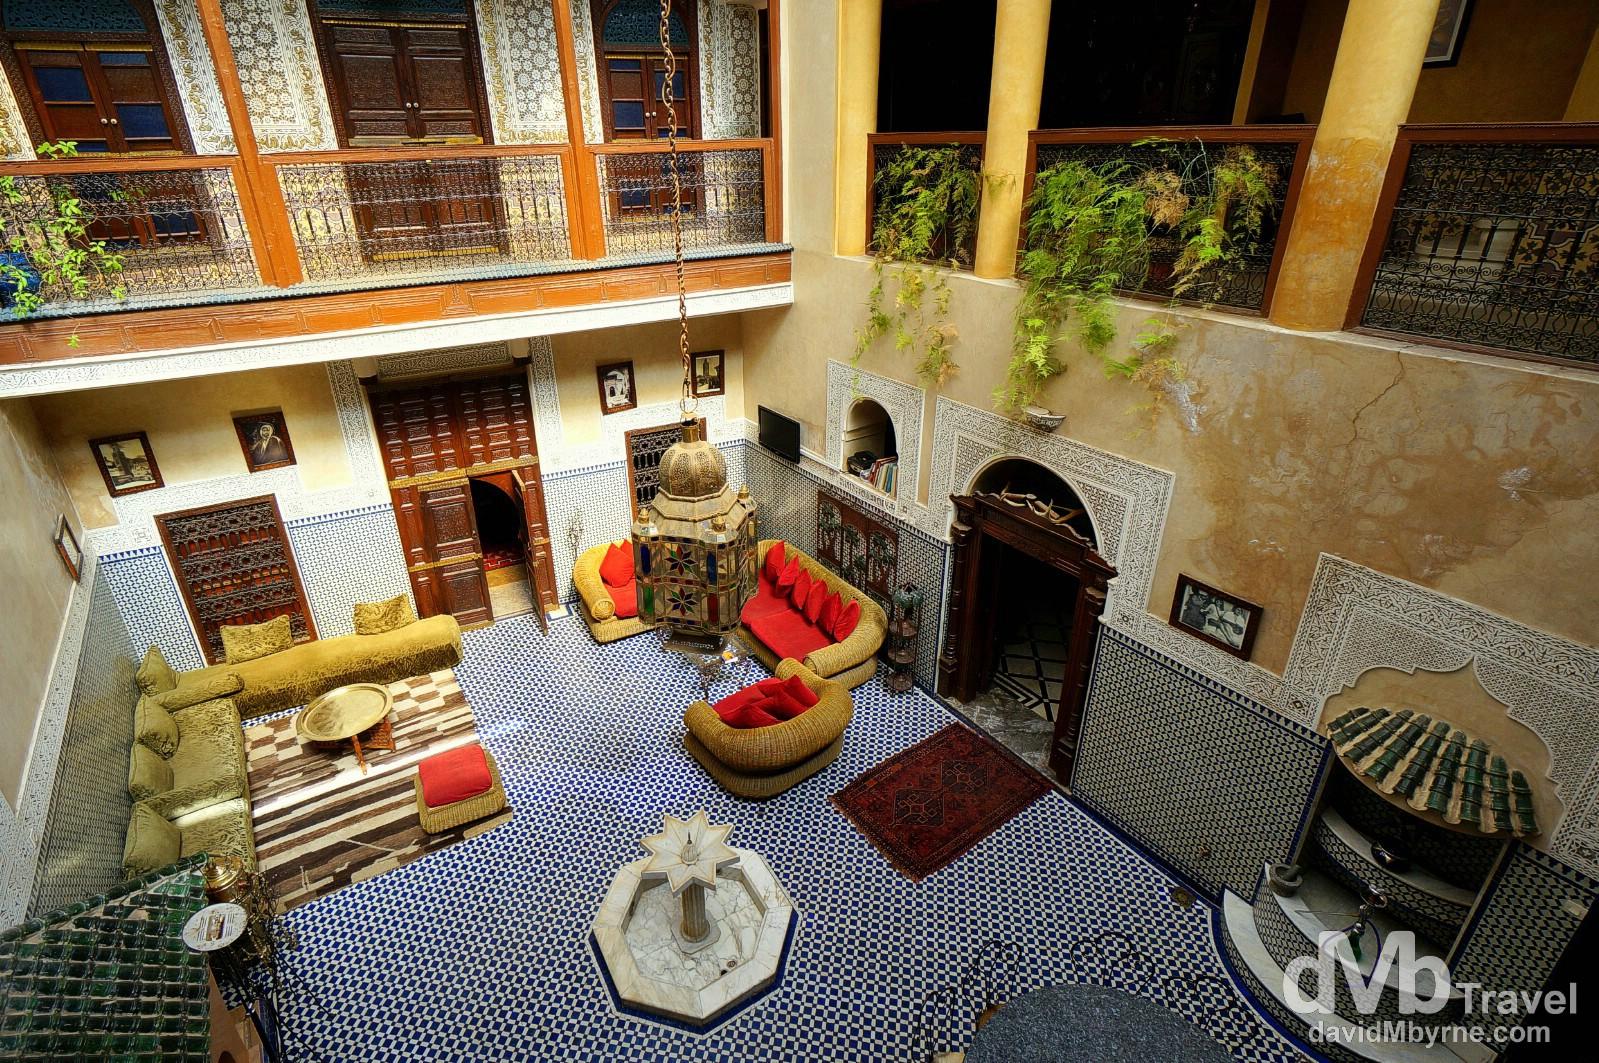 Riad Amlal, Marrakesh, Morocco. May 5th, 2014.